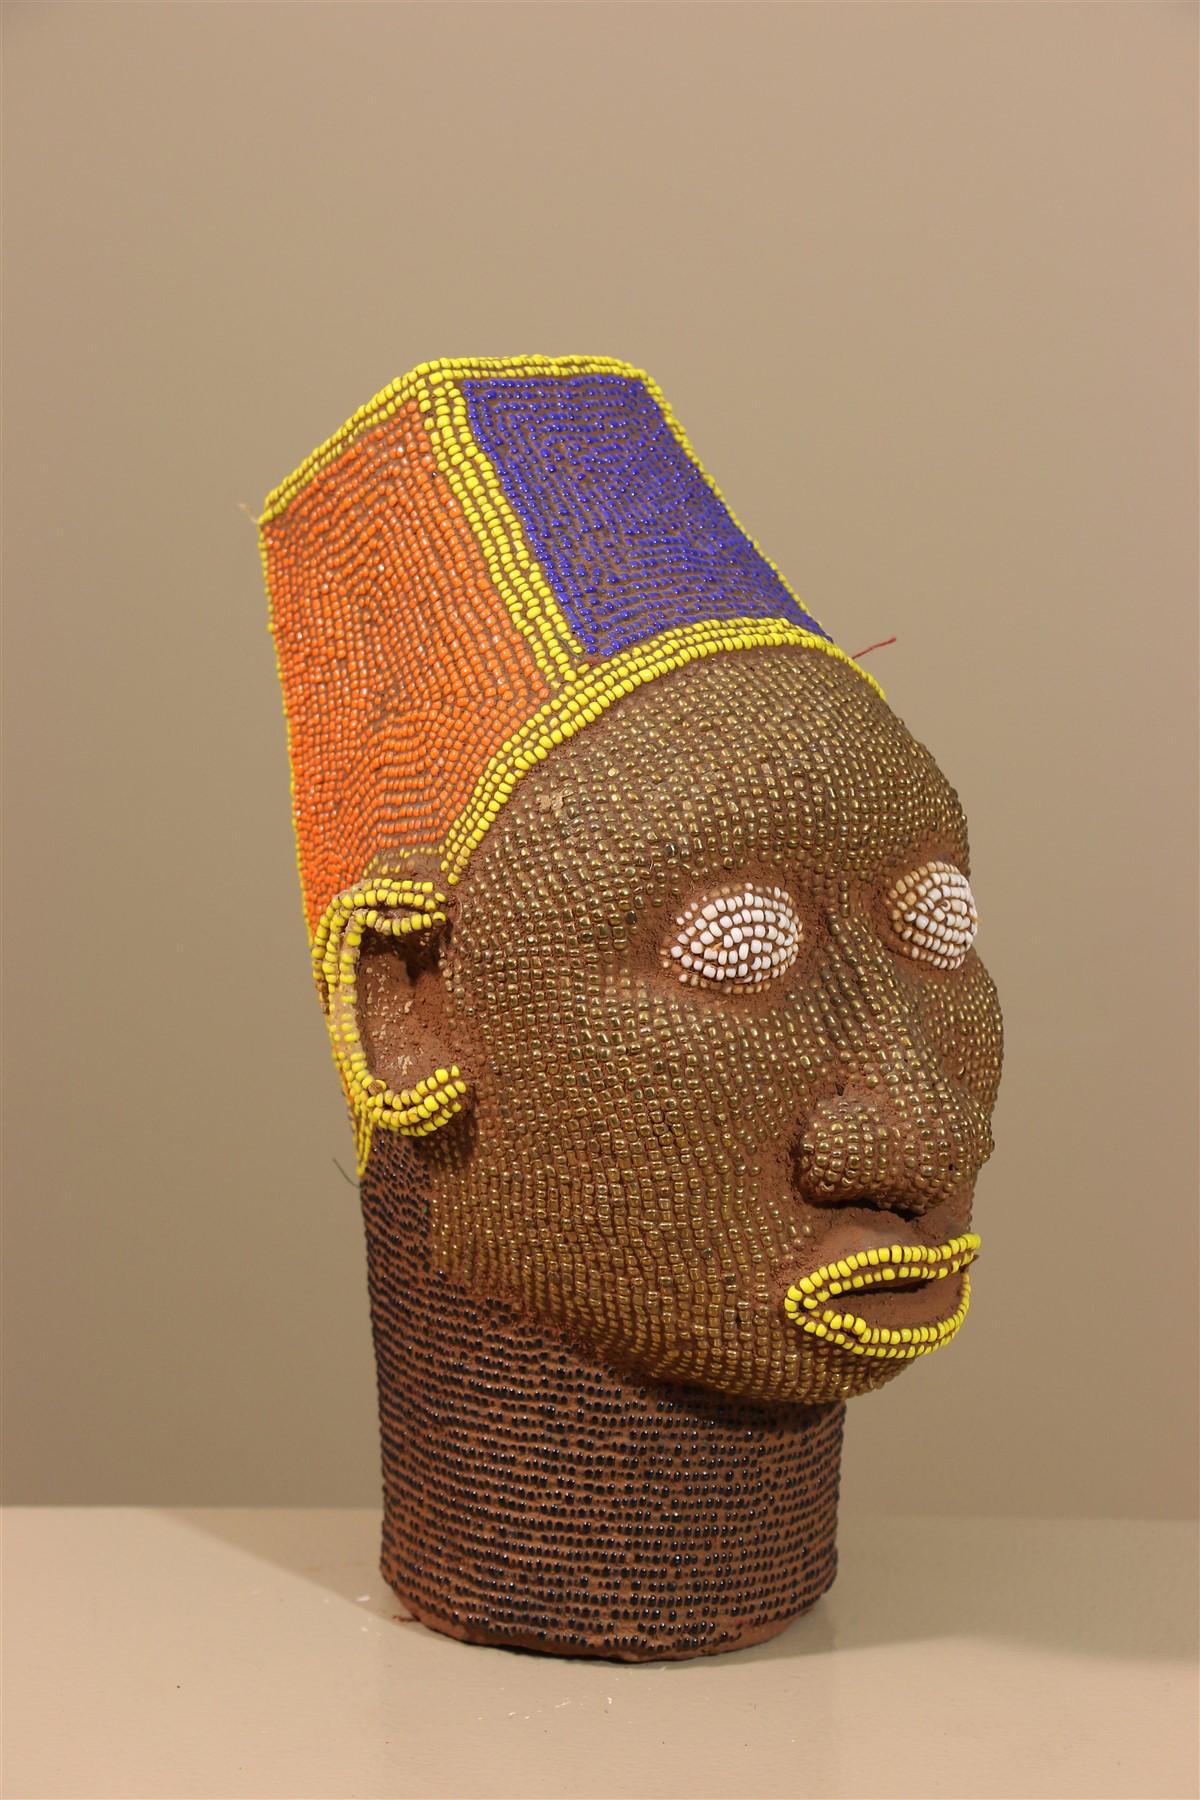 Tête royale perlée Bamileke